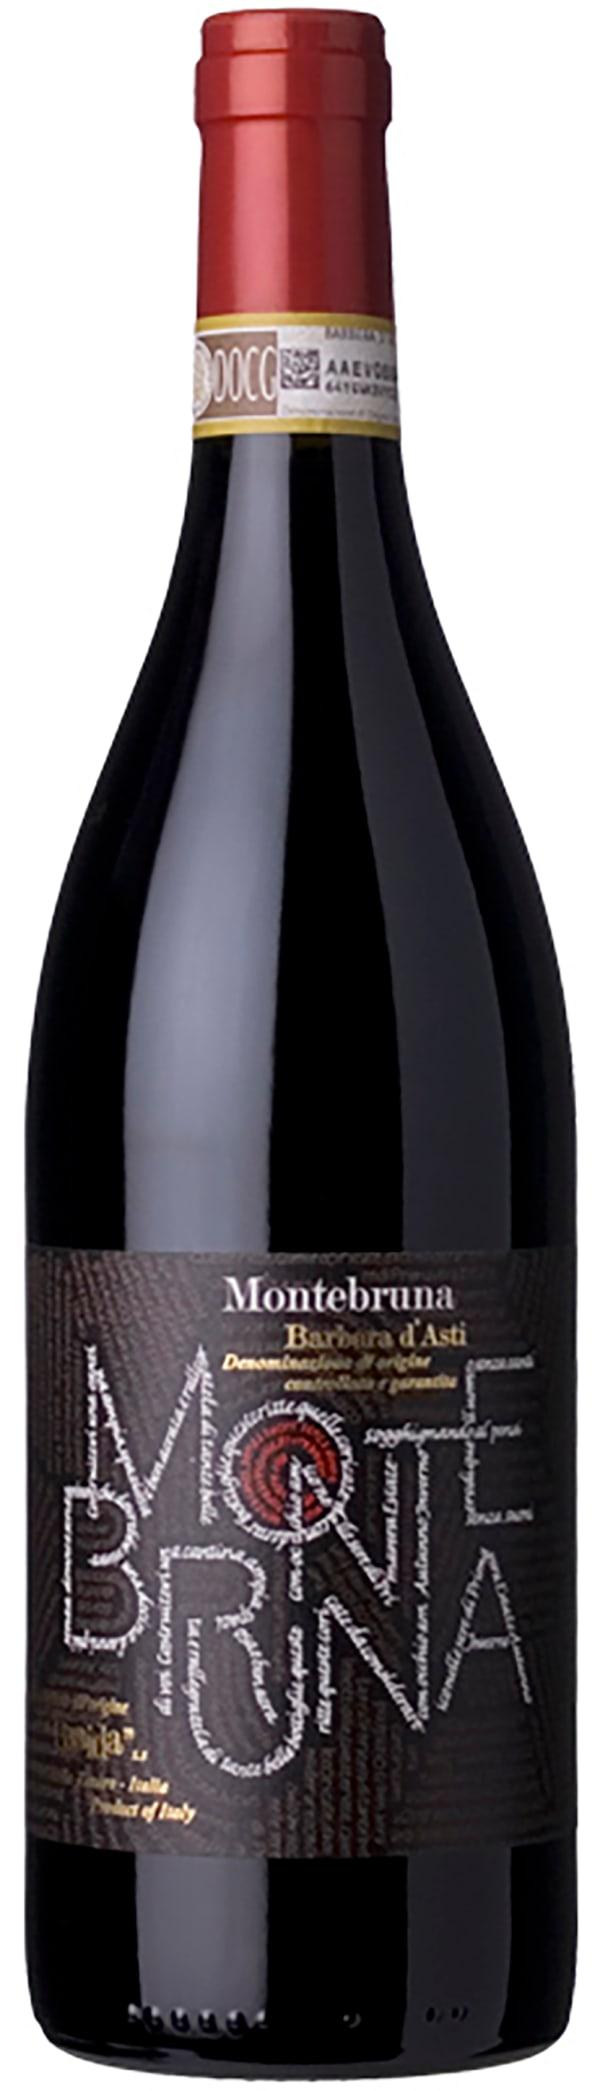 Montebruna Barbera d'Asti 2017